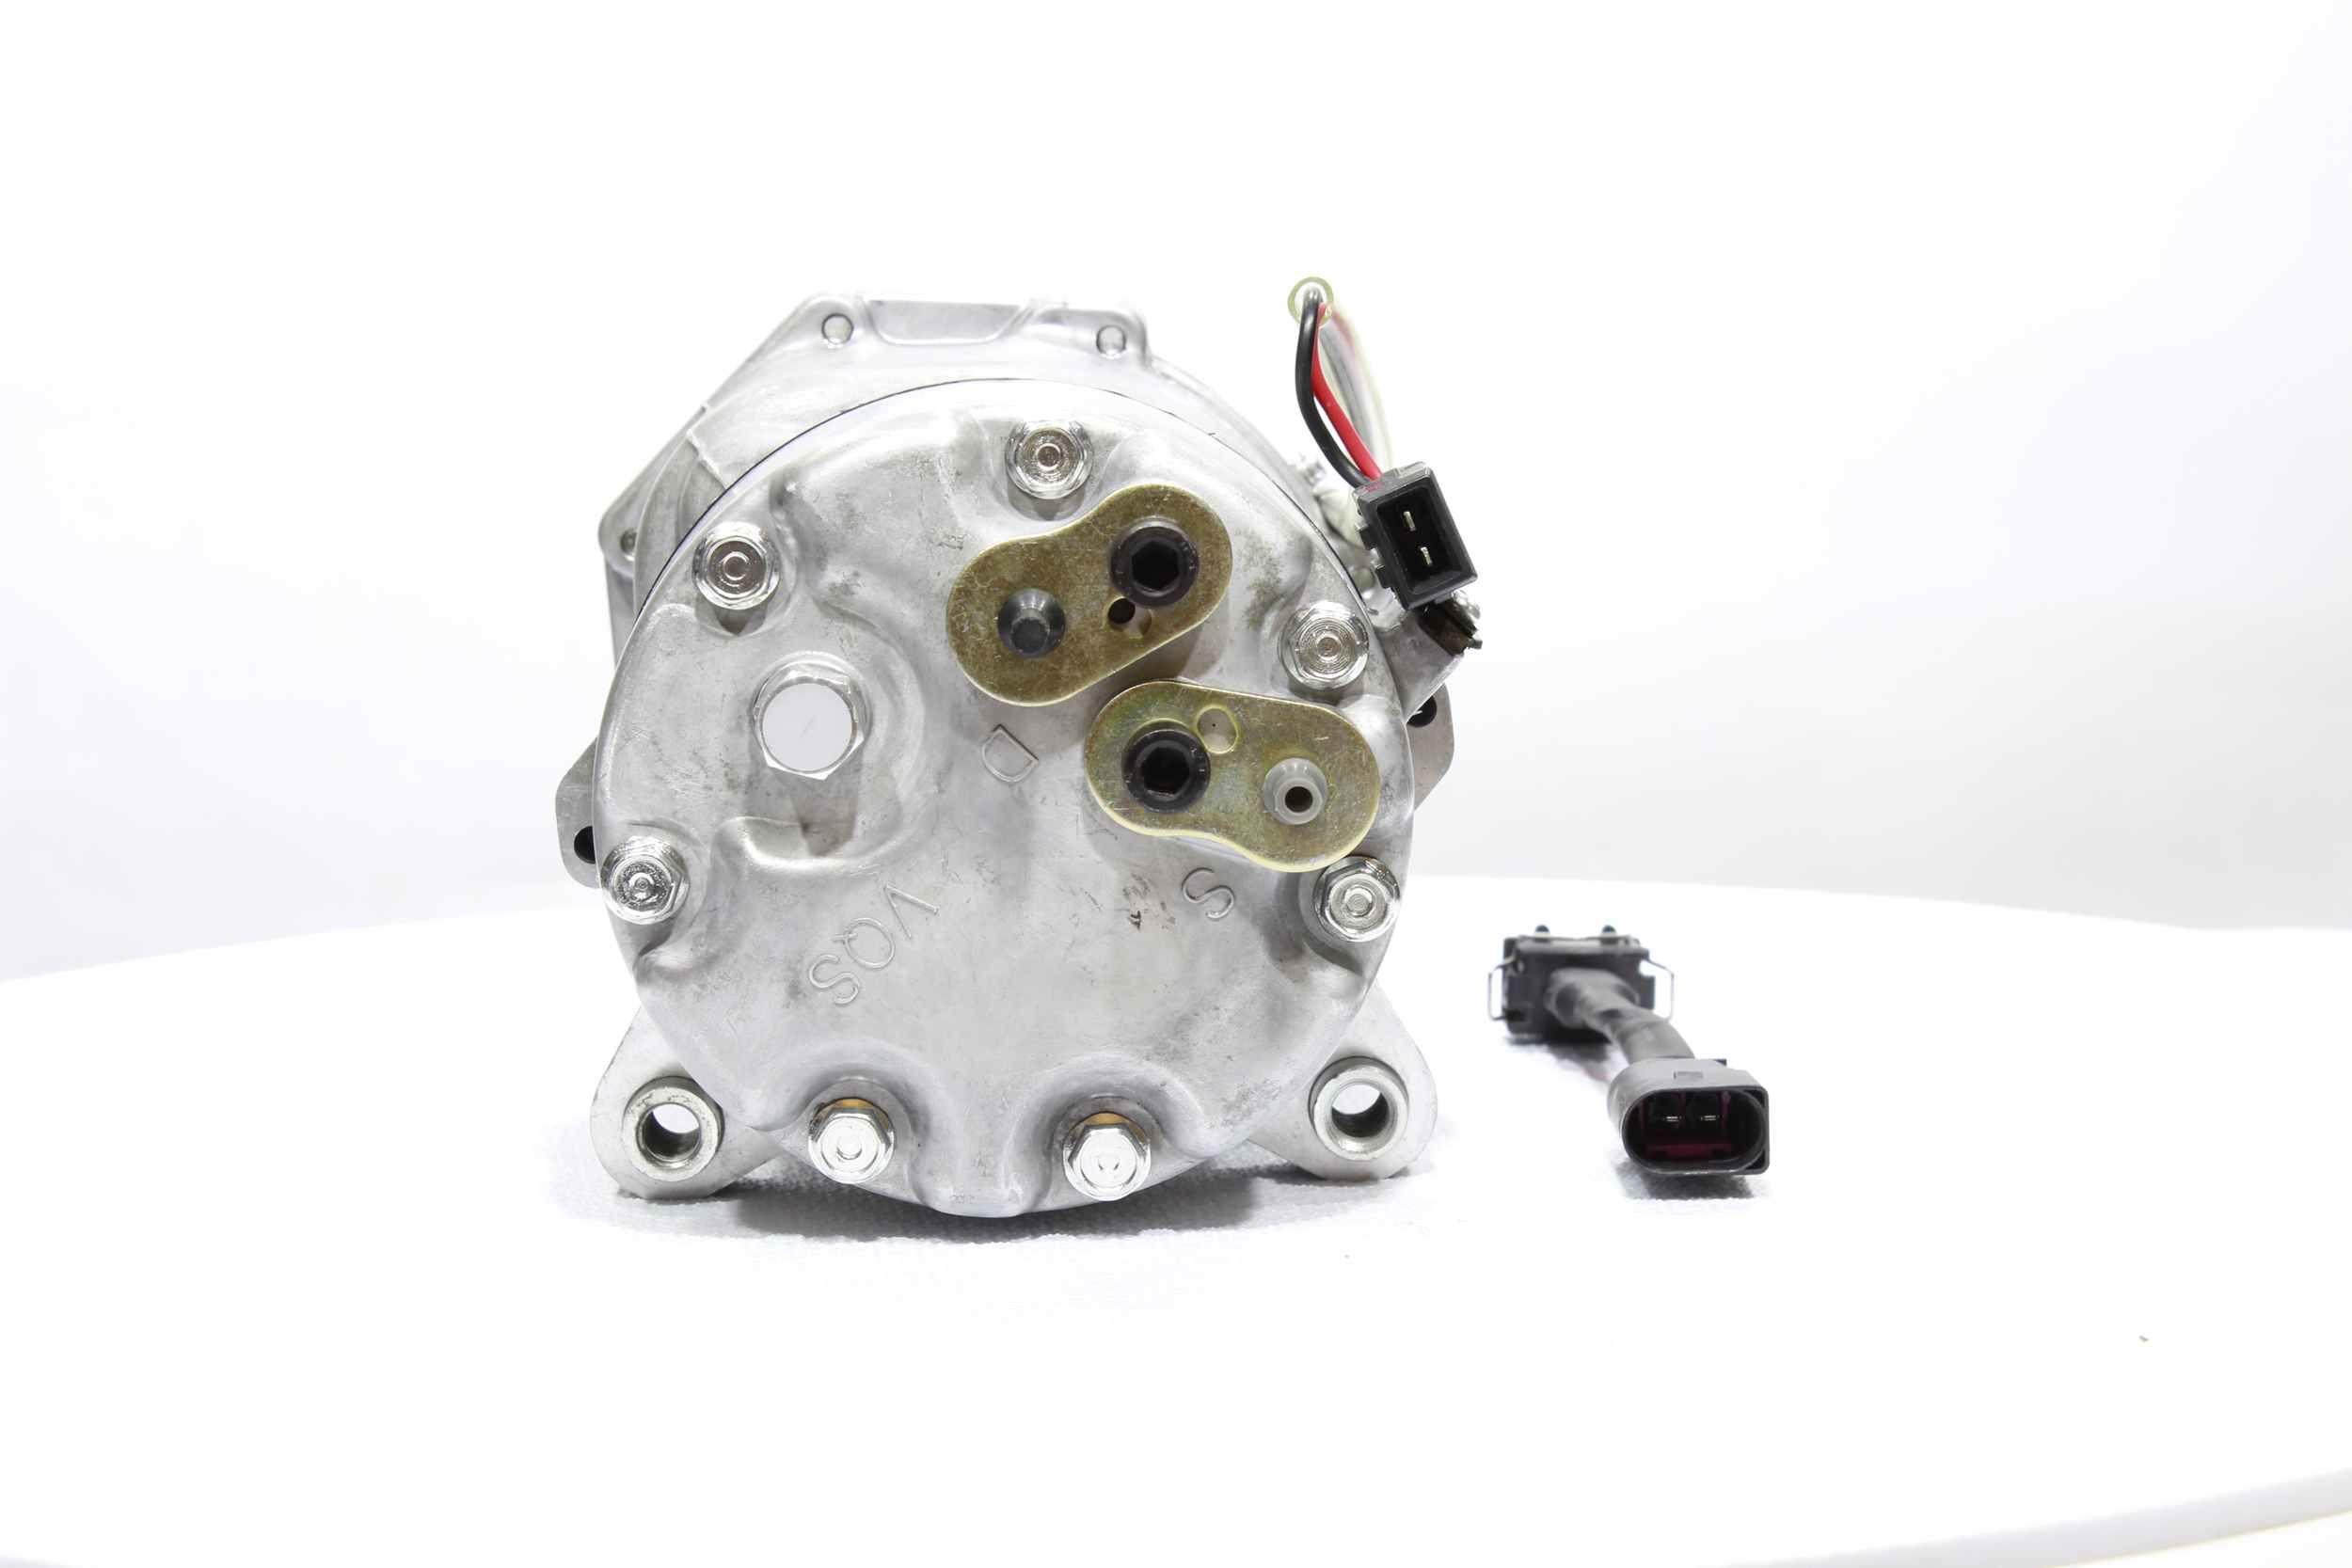 10550015 Kompressor, Klimaanlage ALANKO 550015 - Große Auswahl - stark reduziert